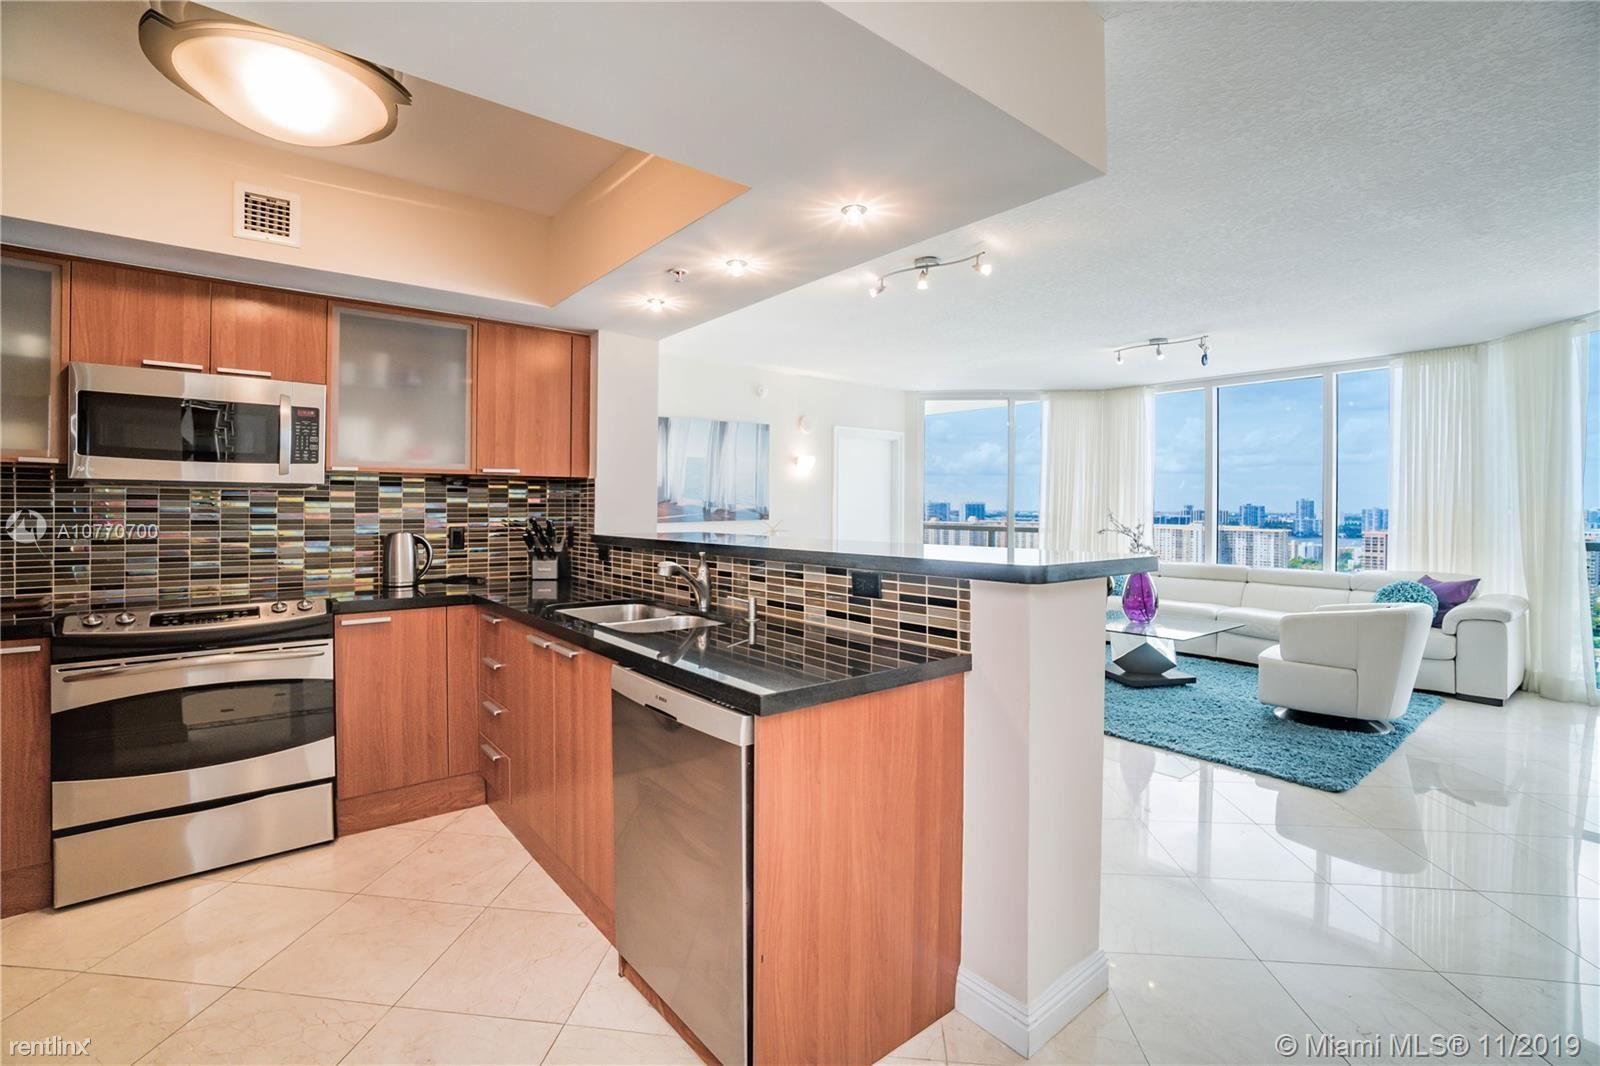 16699 Collins Ave, Sunny Isles Beach, FL - $4,500